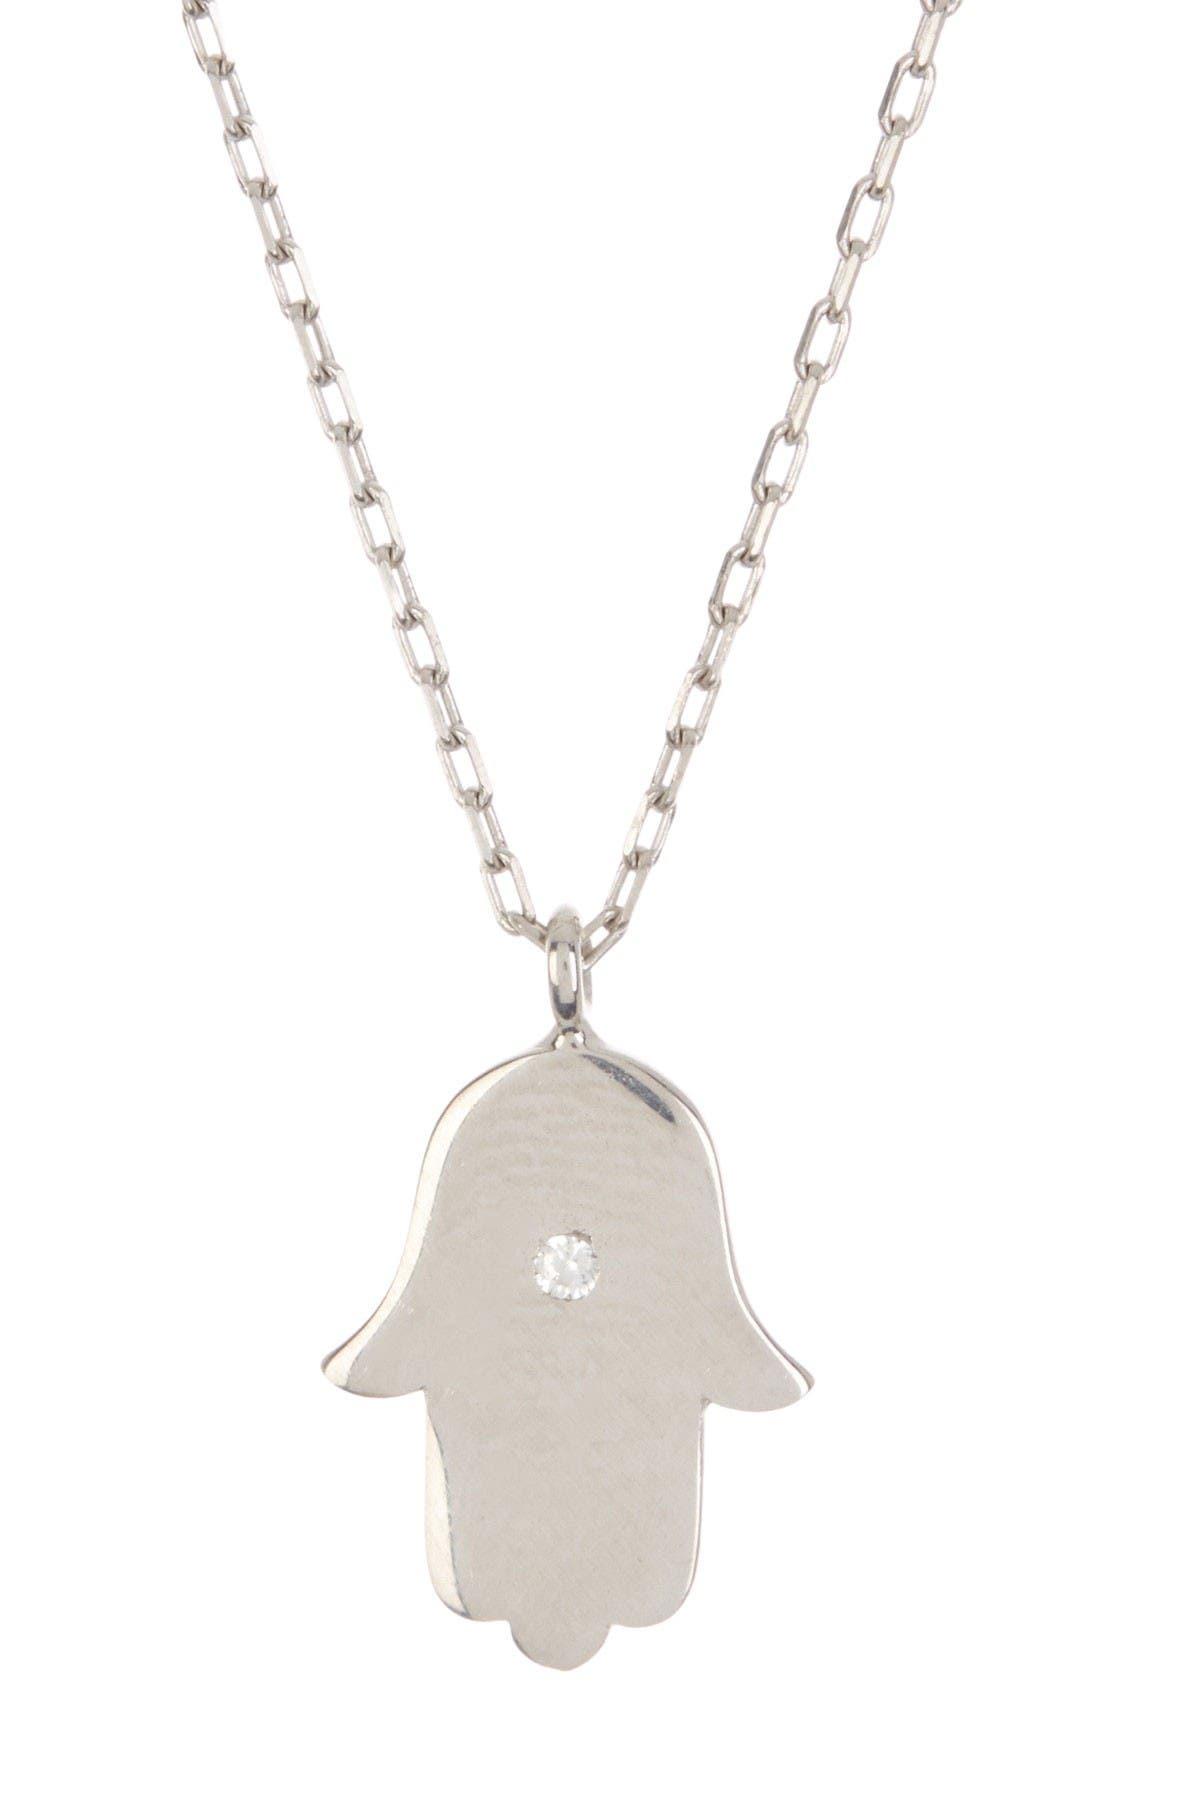 Image of Argento Vivo CZ Hamsa Pendant Necklace